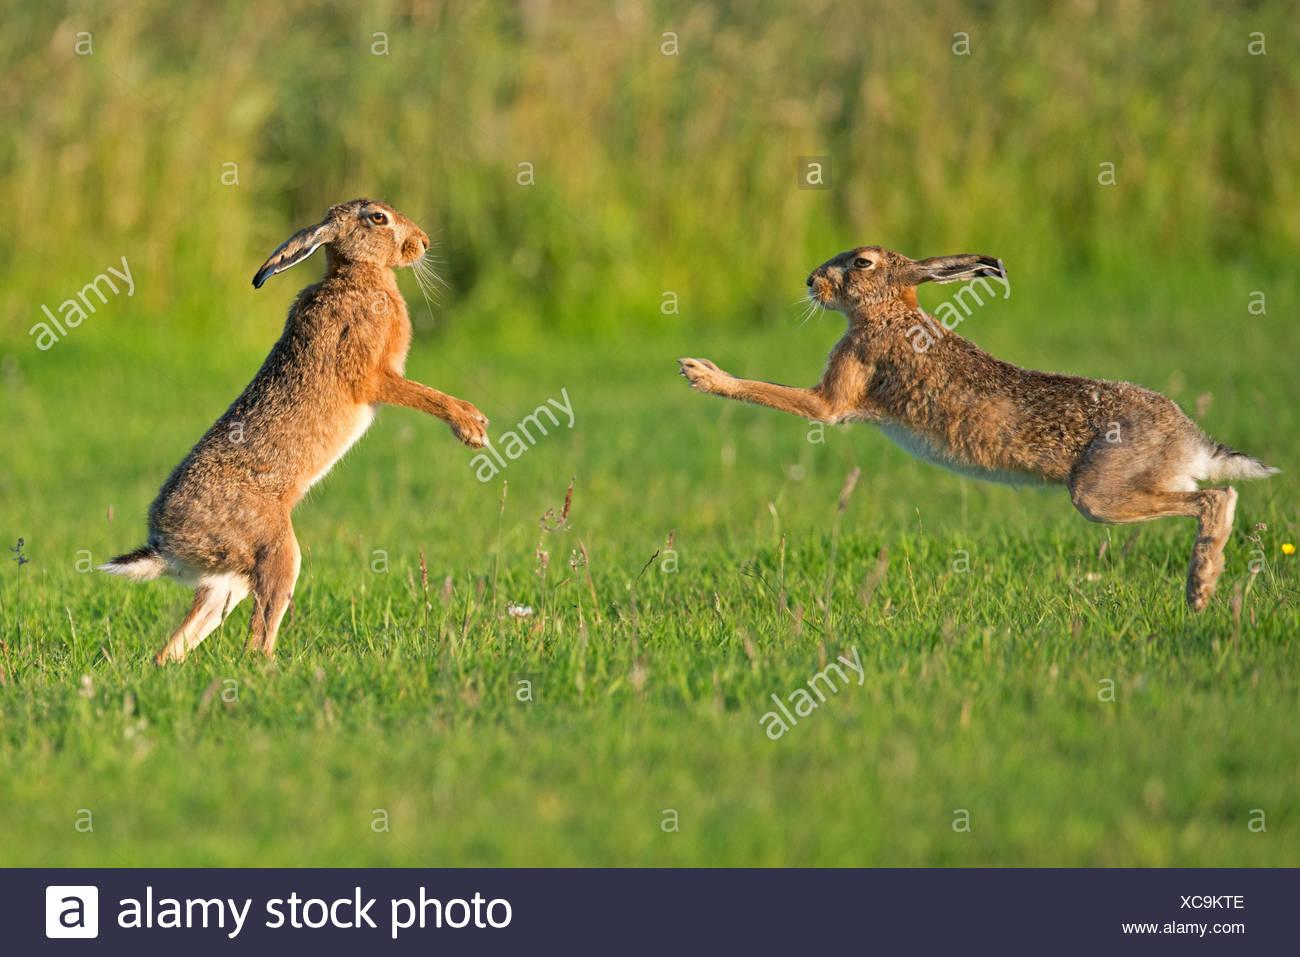 European hares (Lepus europaeus) boxing, UK - Stock Image